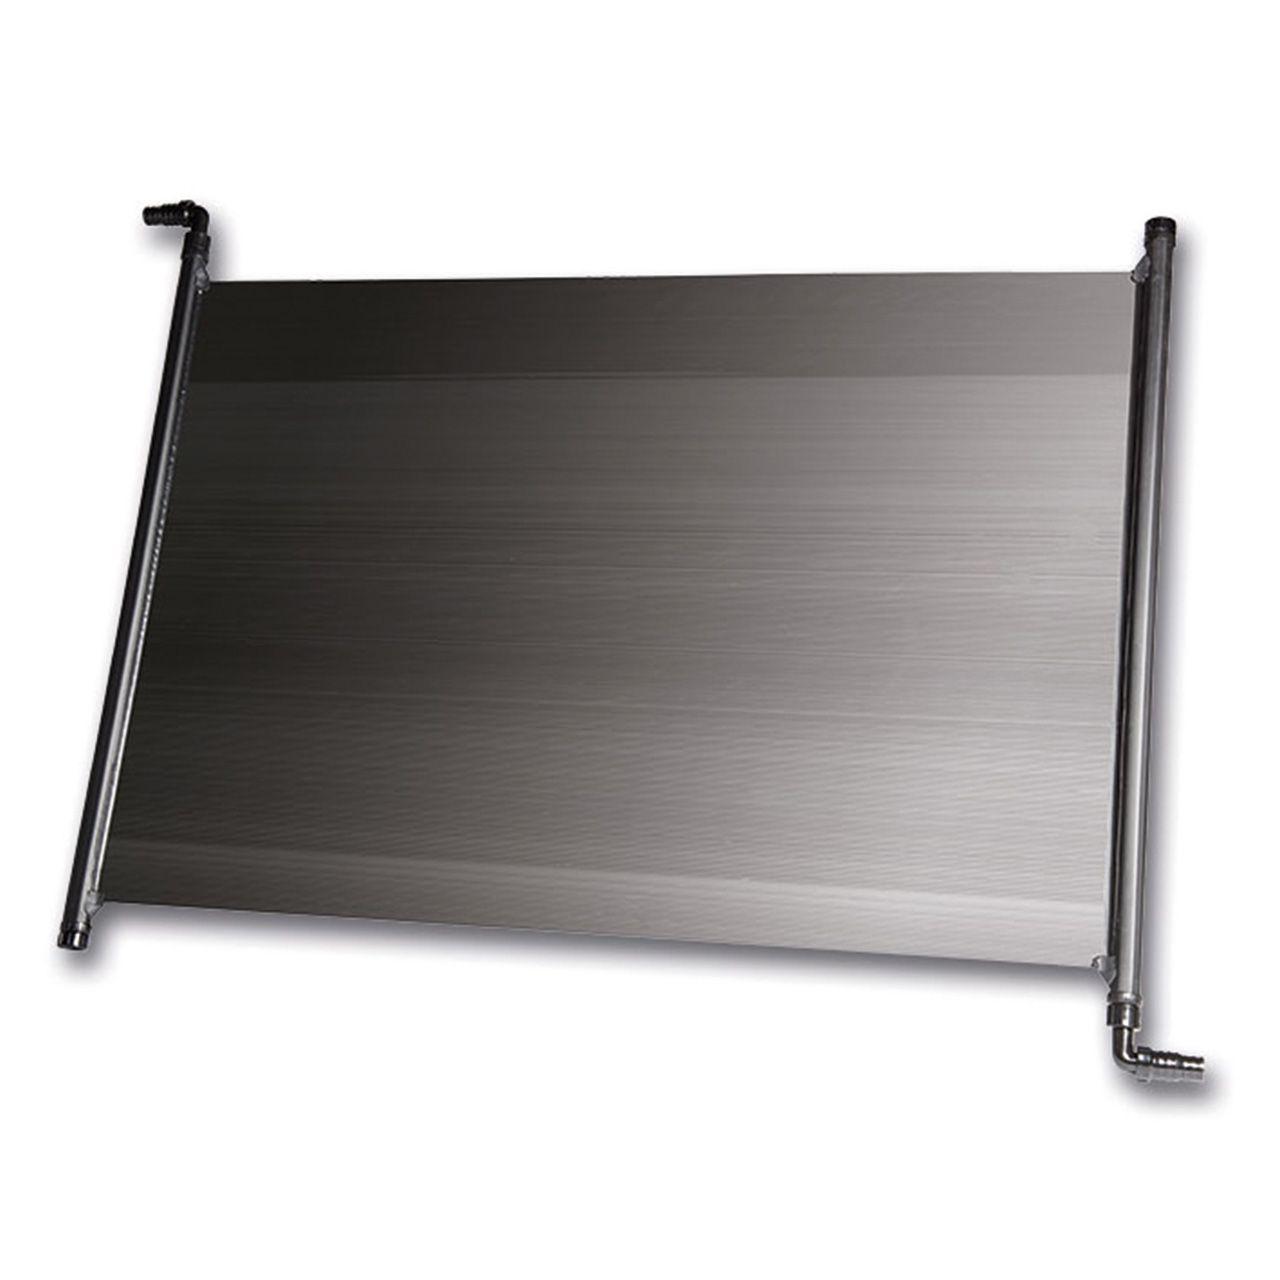 solarabsorber poolheizung eco 3 6m fkb schwimmbadtechnik. Black Bedroom Furniture Sets. Home Design Ideas